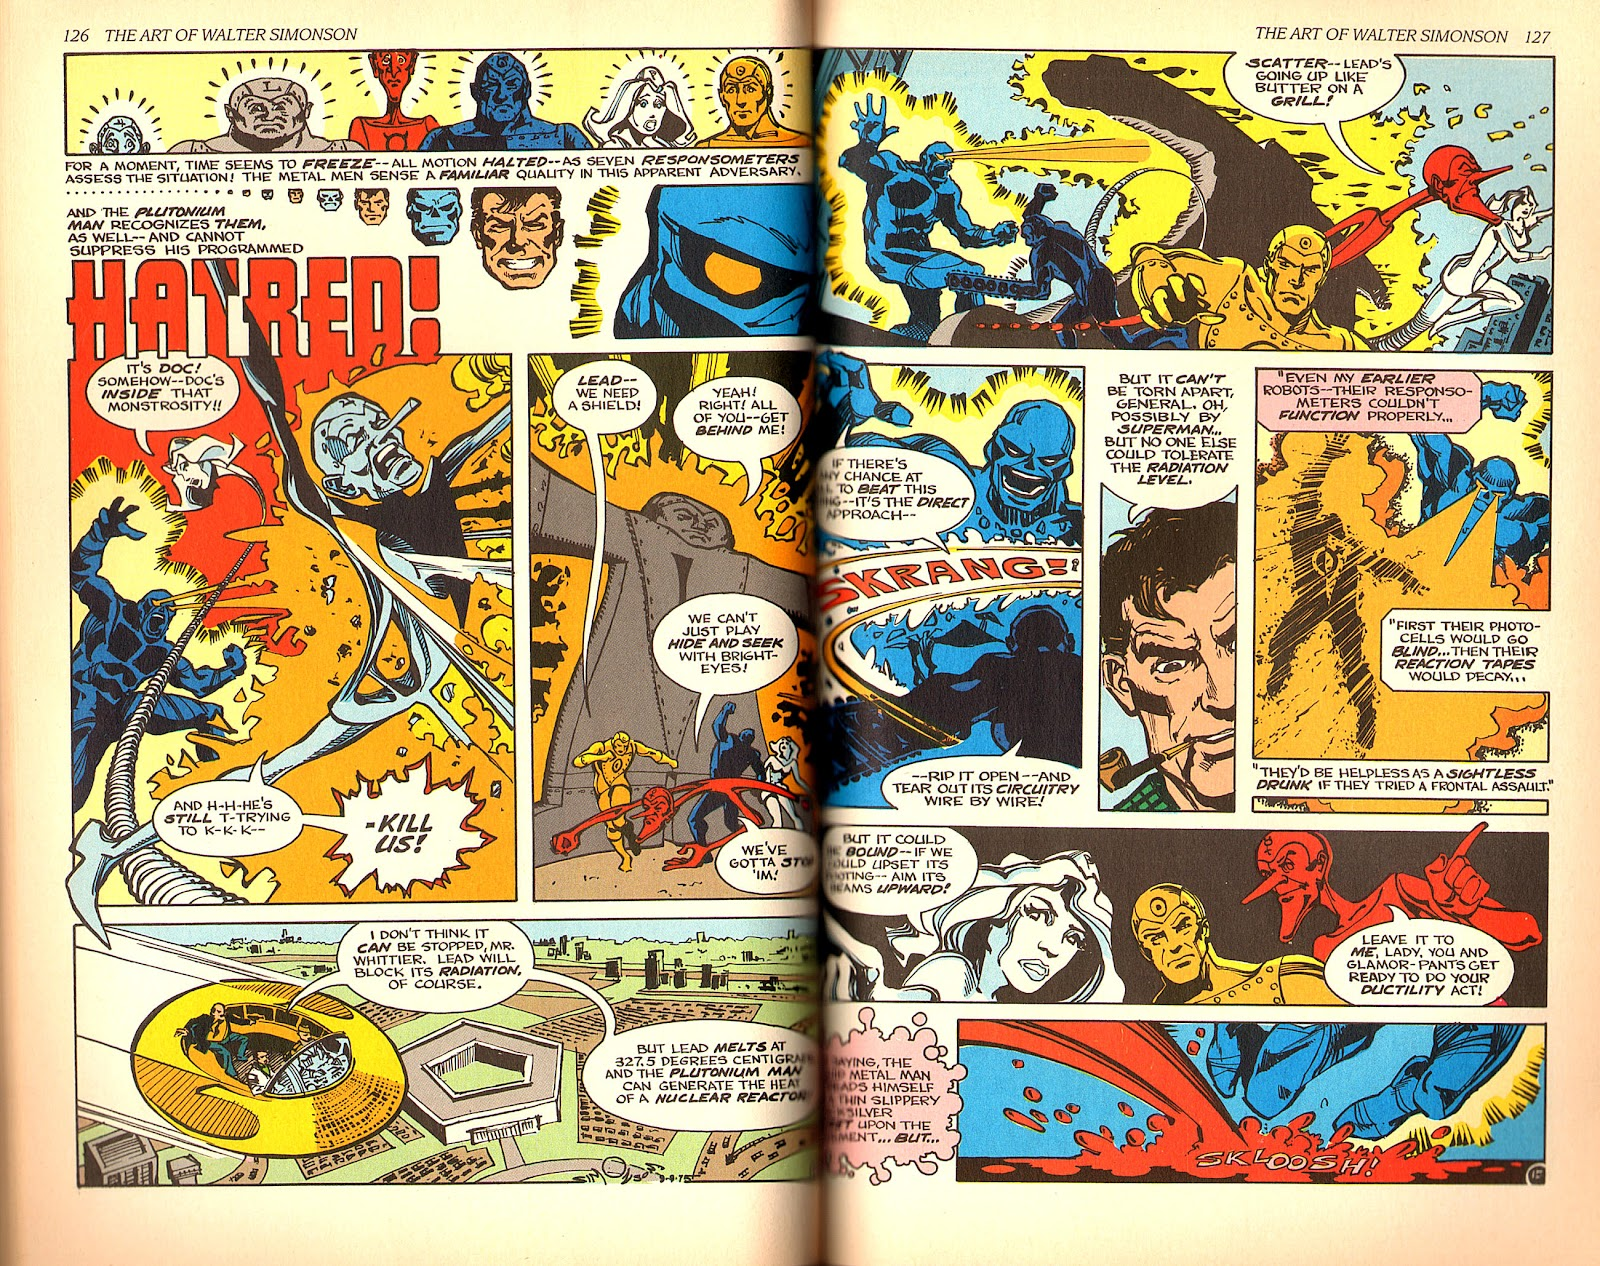 Read online The Art of Walter Simonson comic -  Issue # TPB - 65